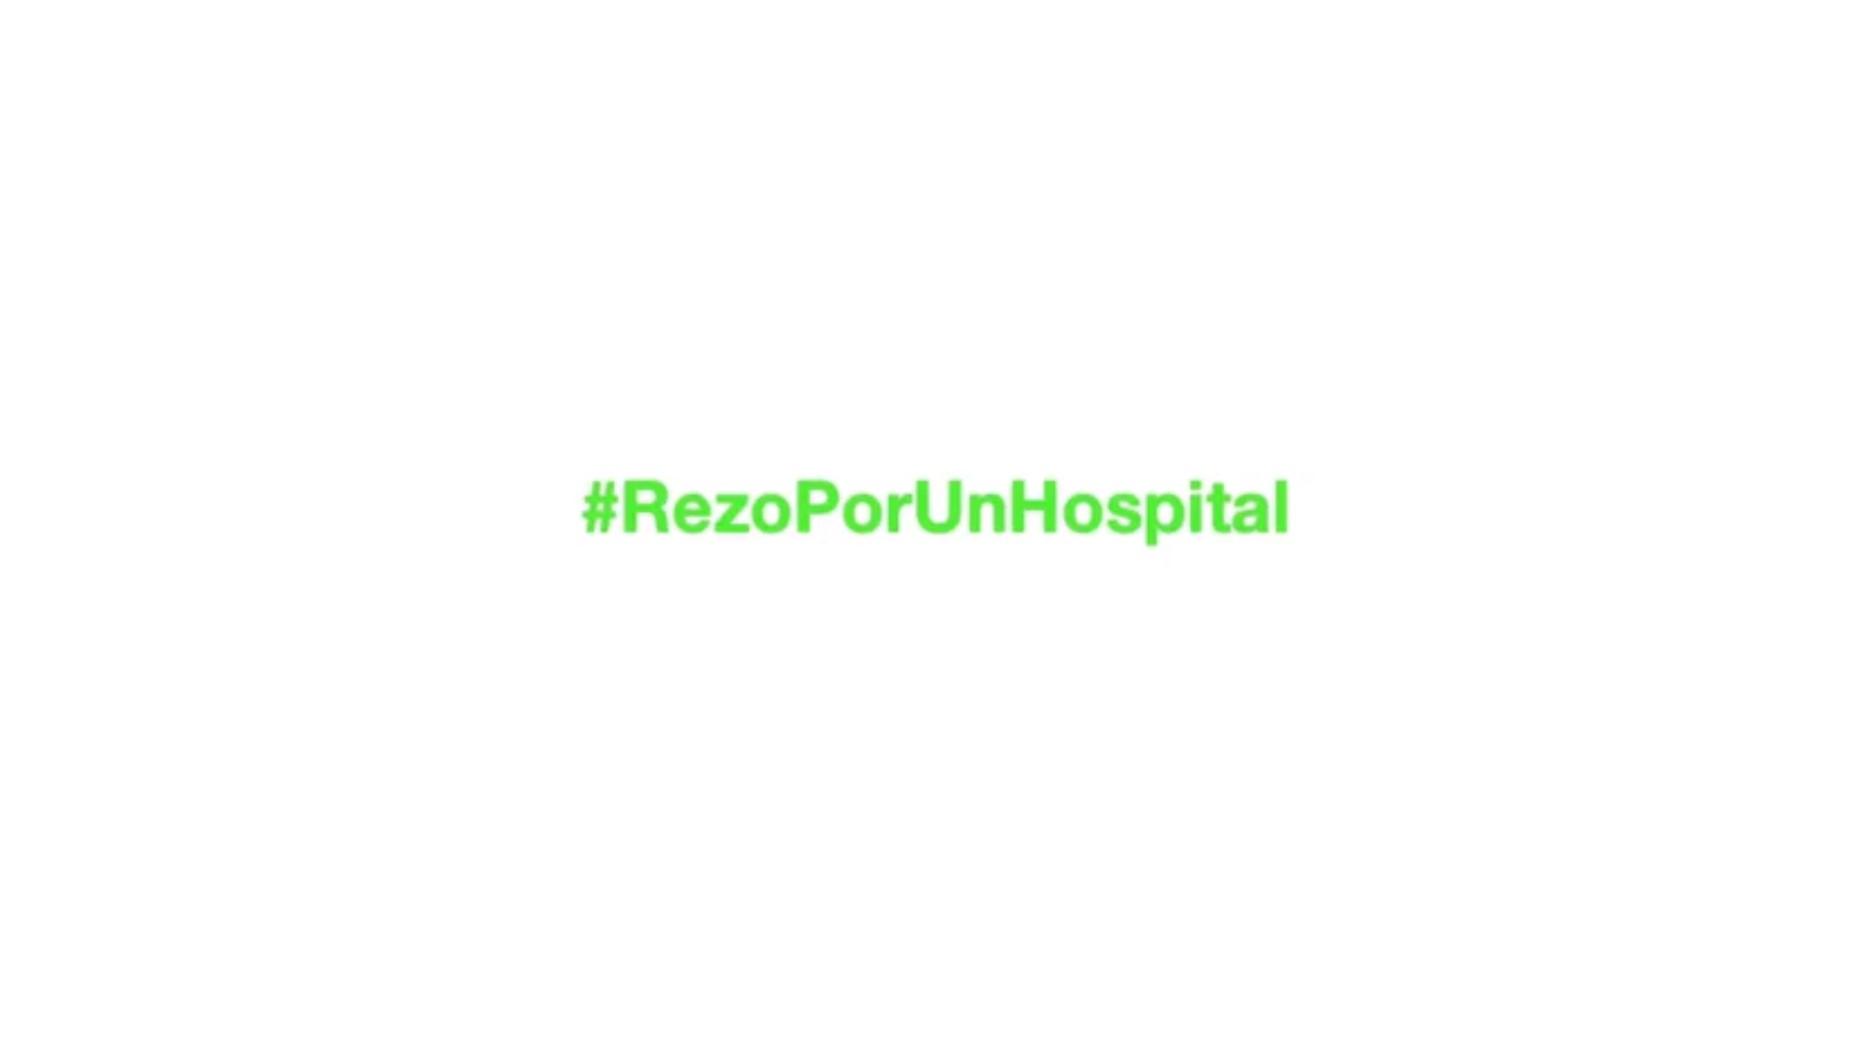 #RezaPorUnHospital